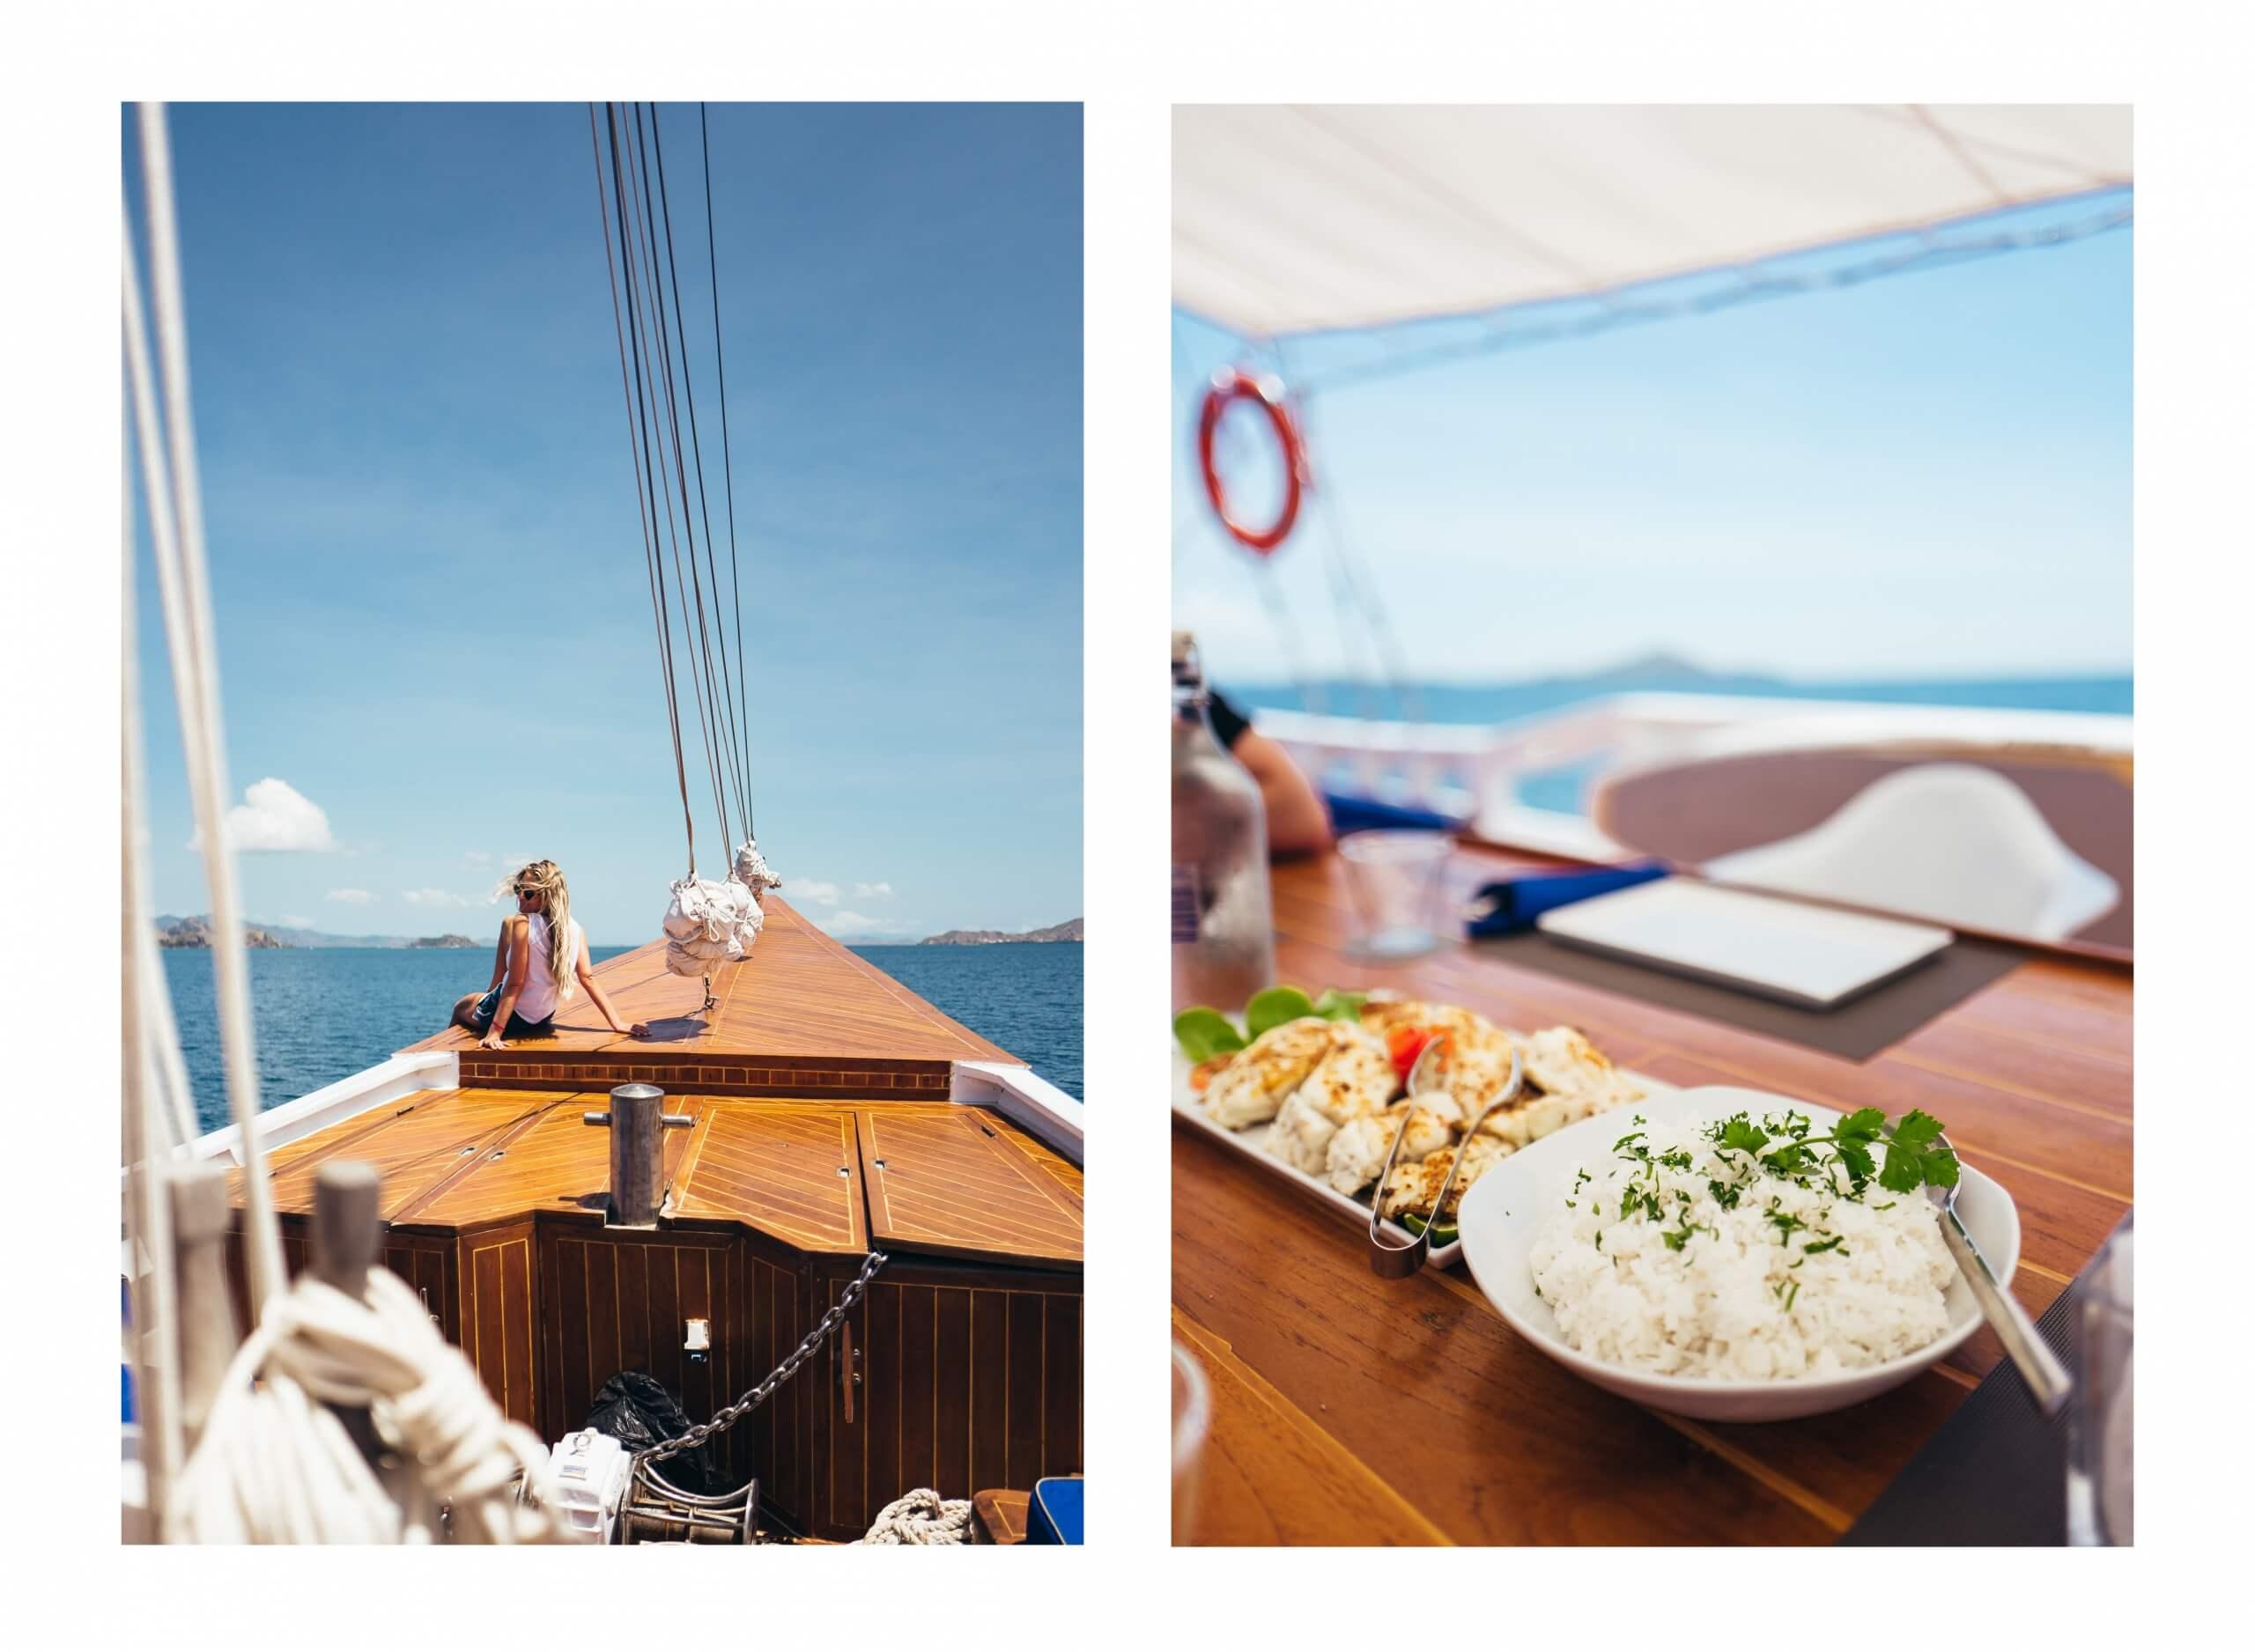 janni-deler-mer-sea-boatL1020154 copy